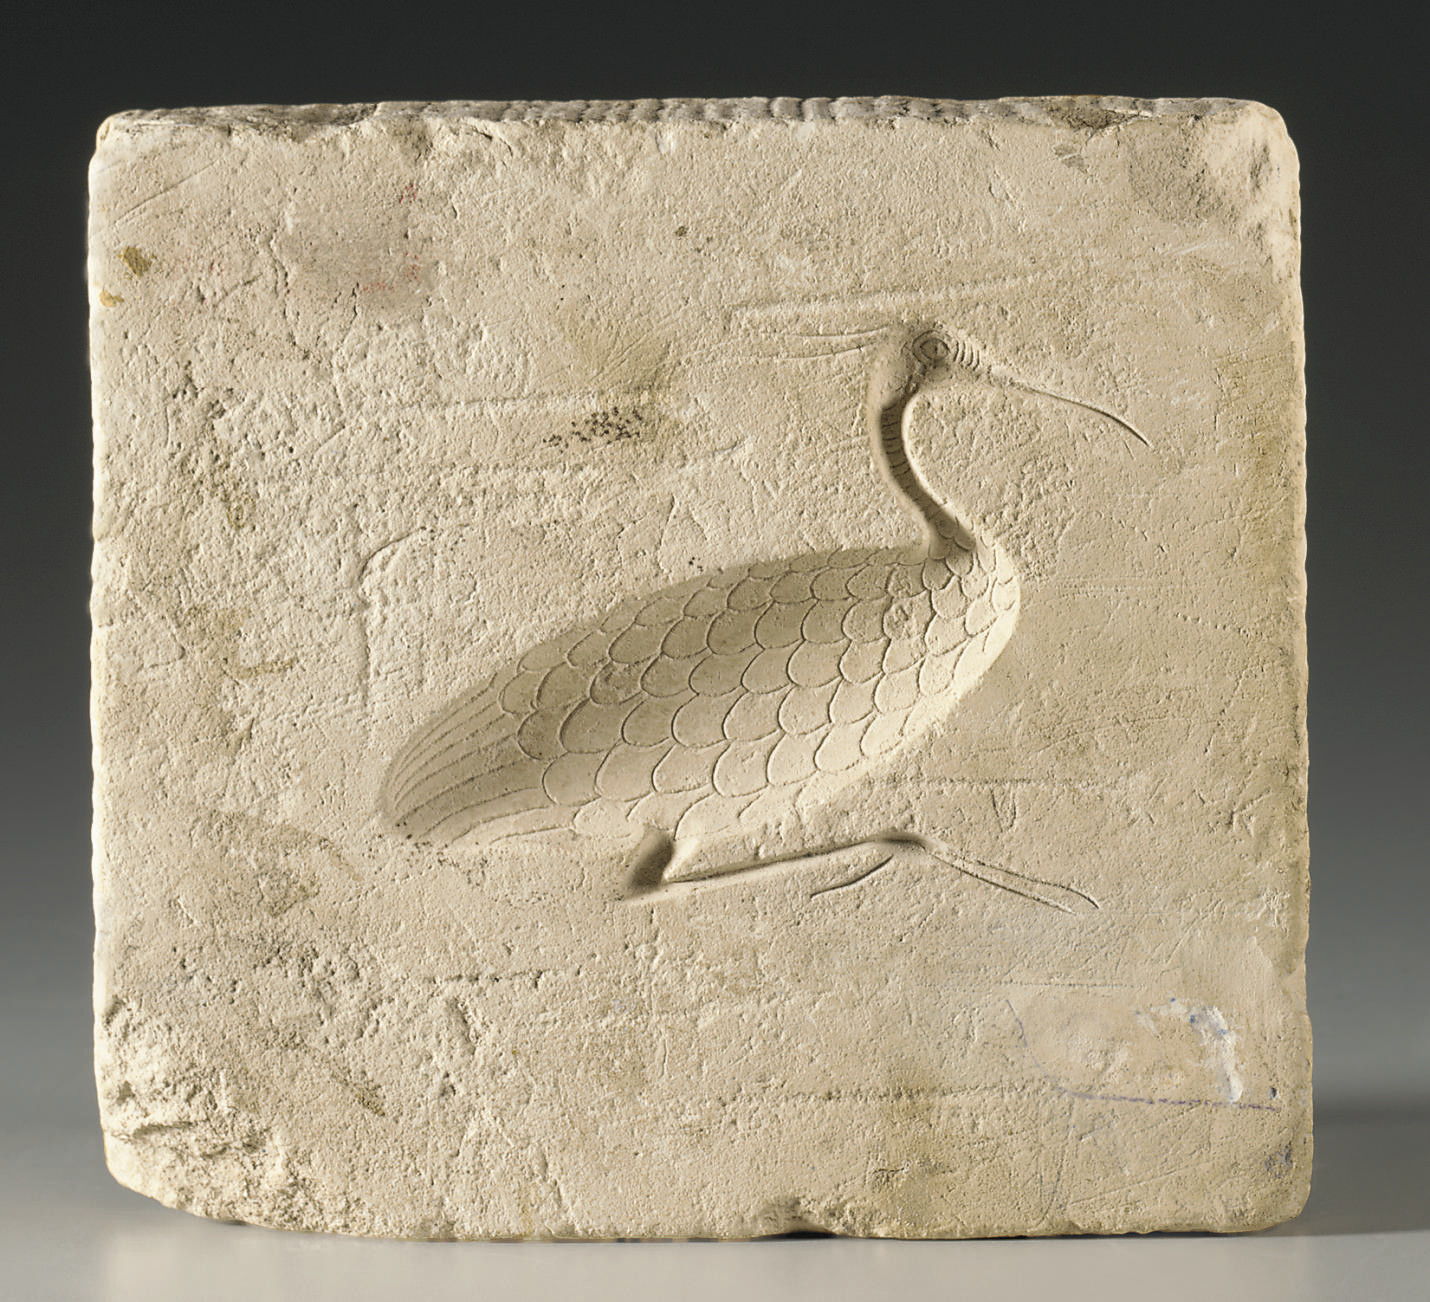 AN EGYPTIAN LIMESTONE MOLD